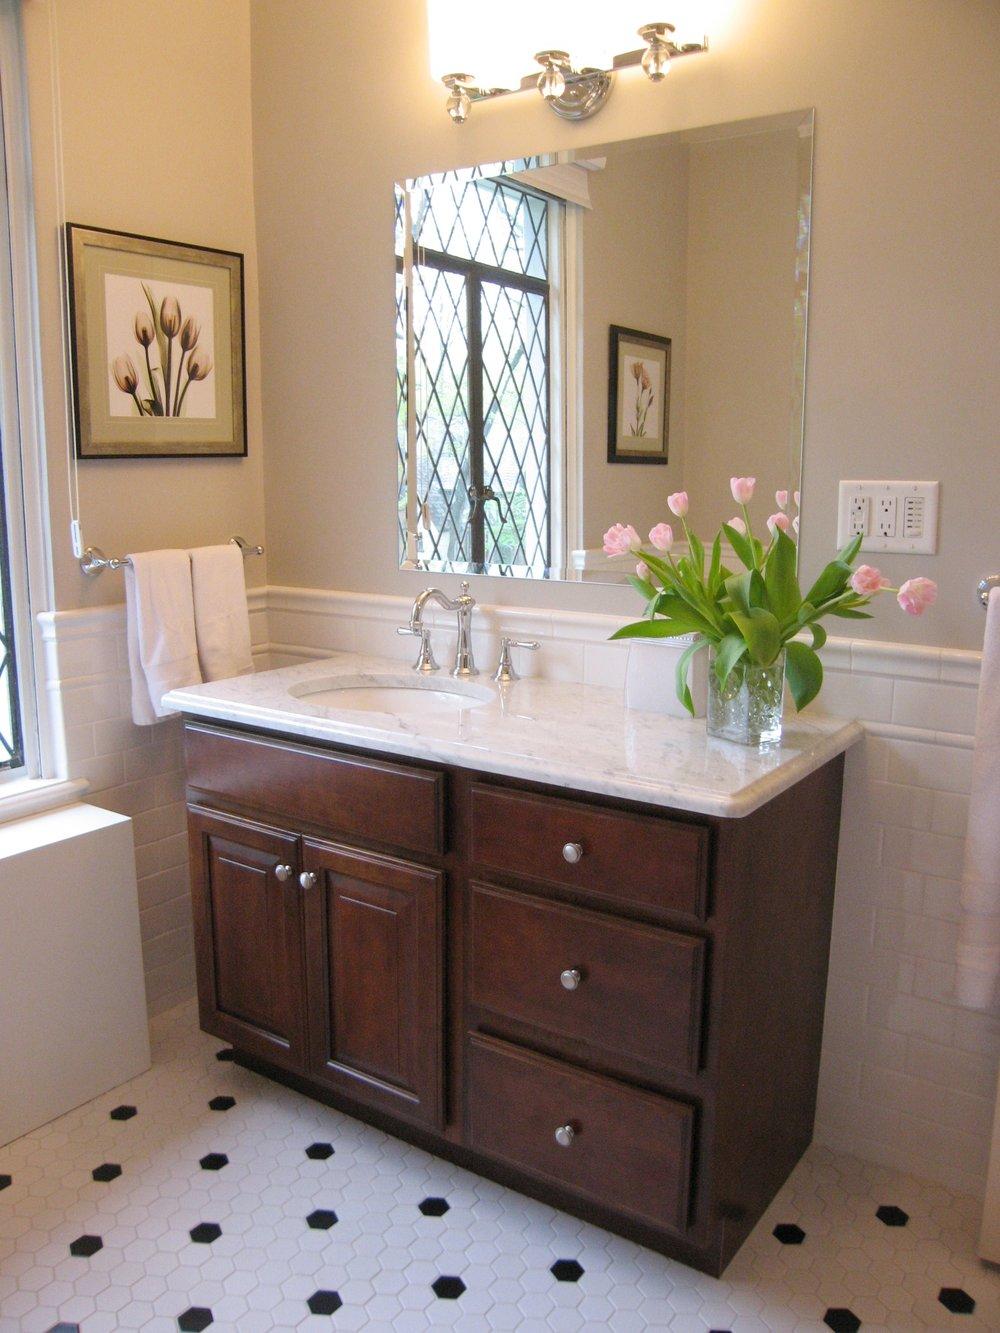 Bathrooms_32.JPG